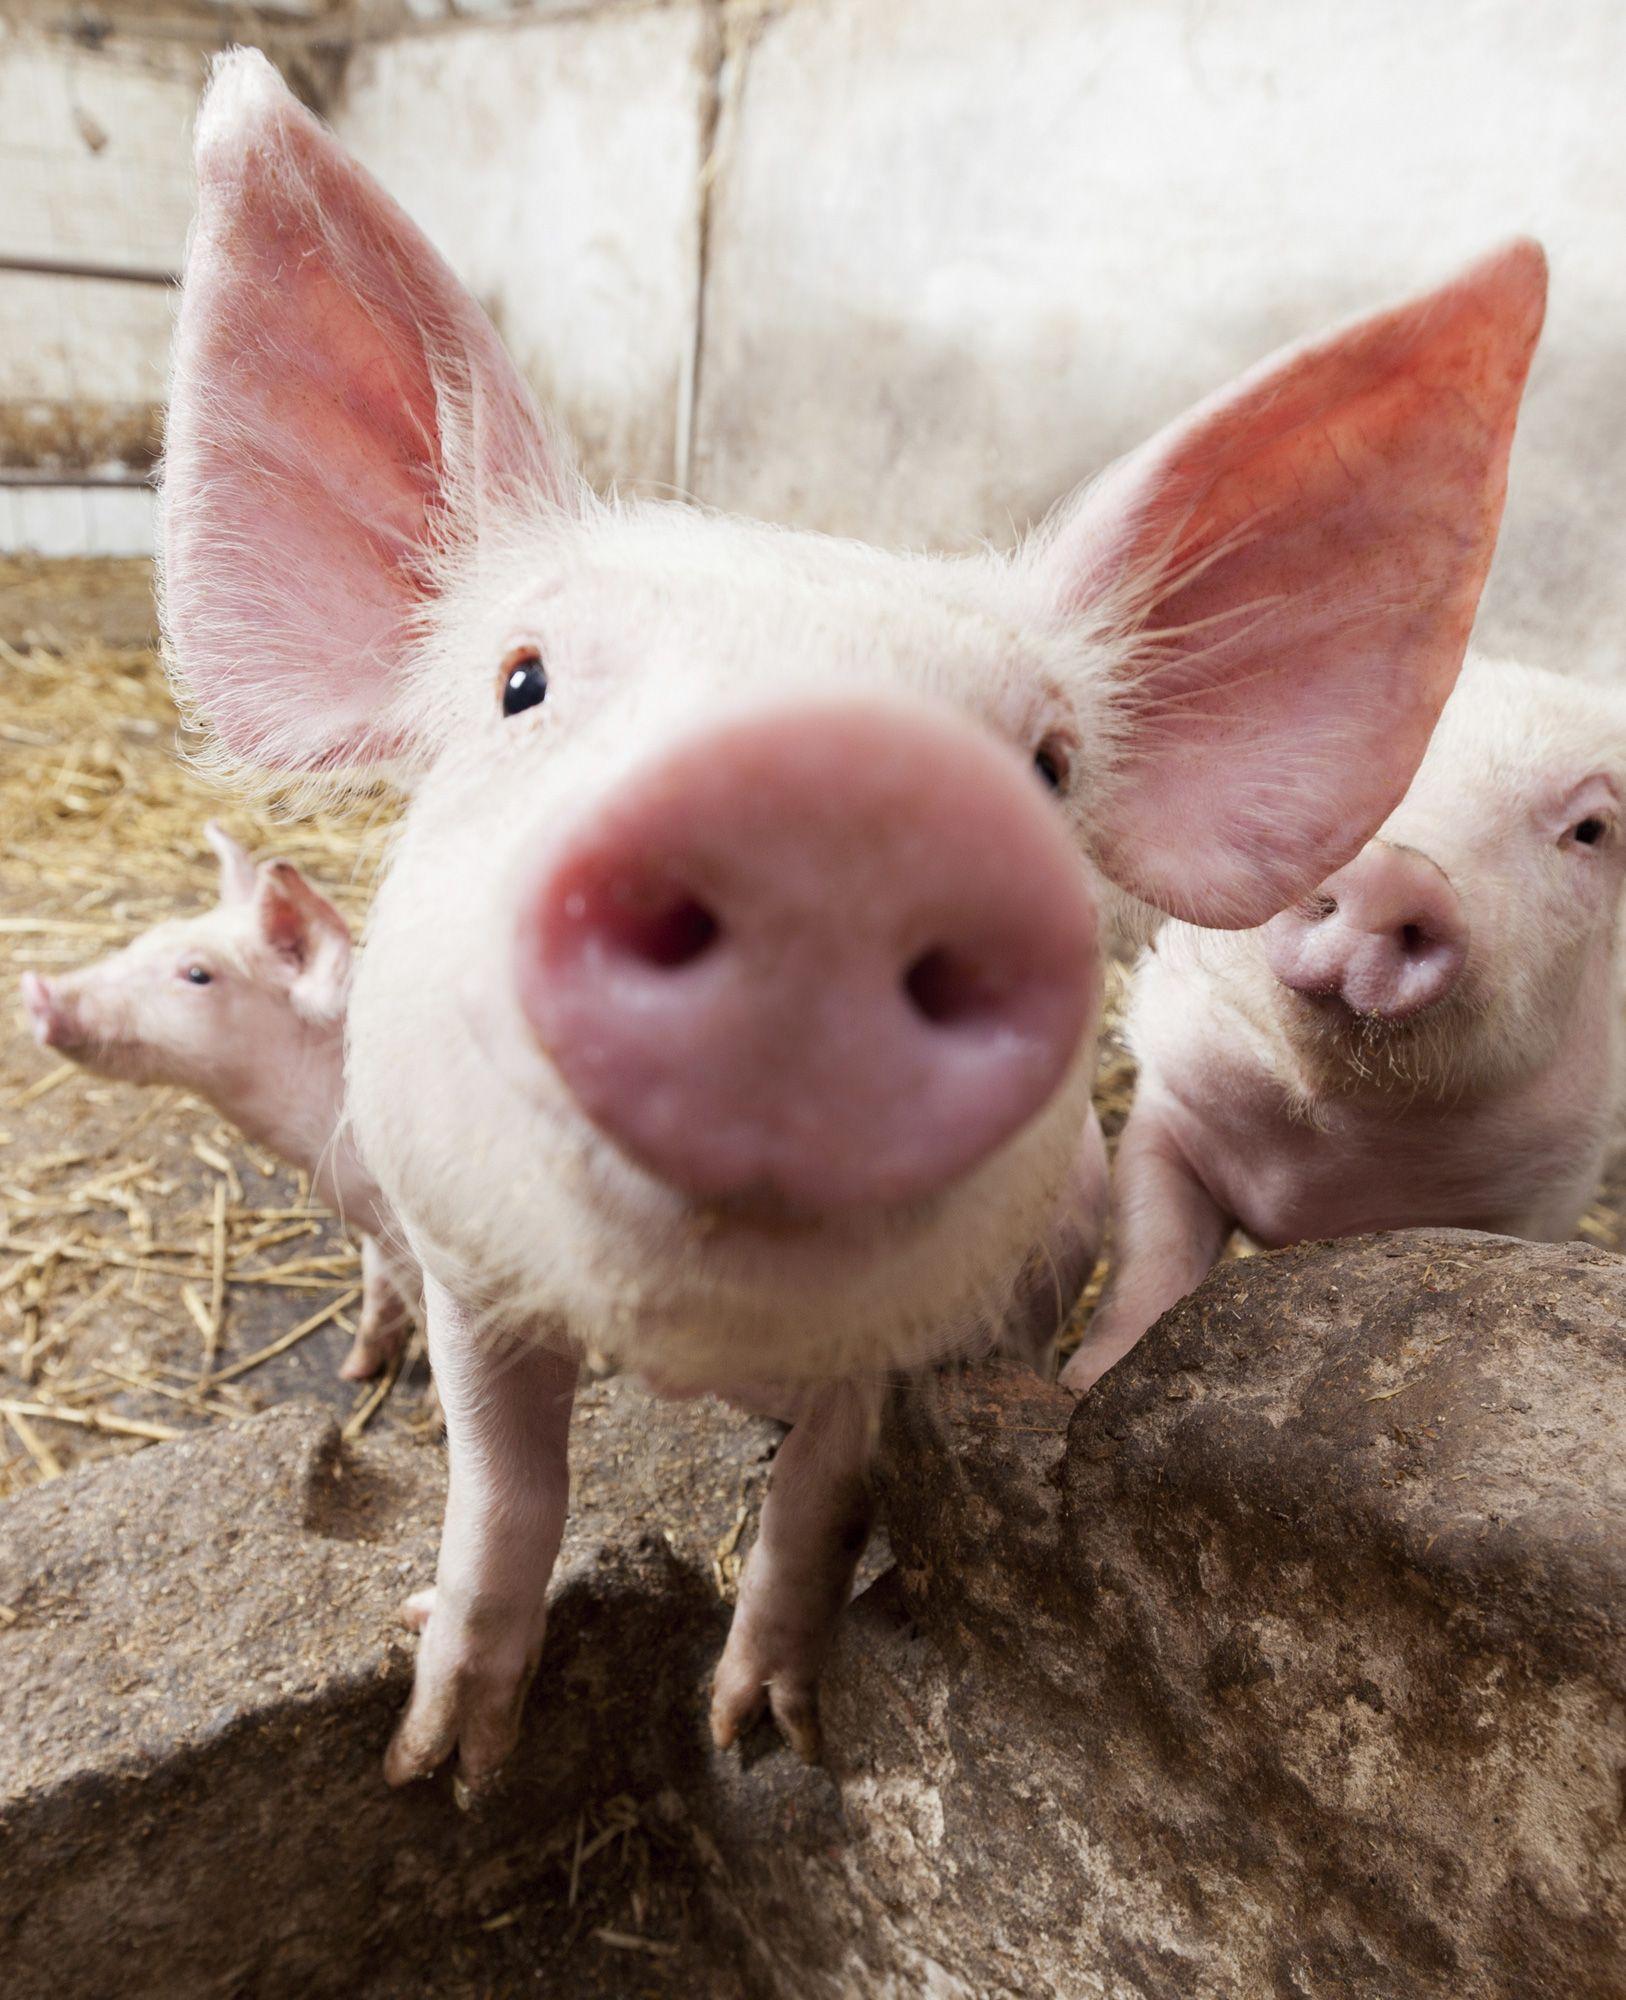 animales granja - cerdo